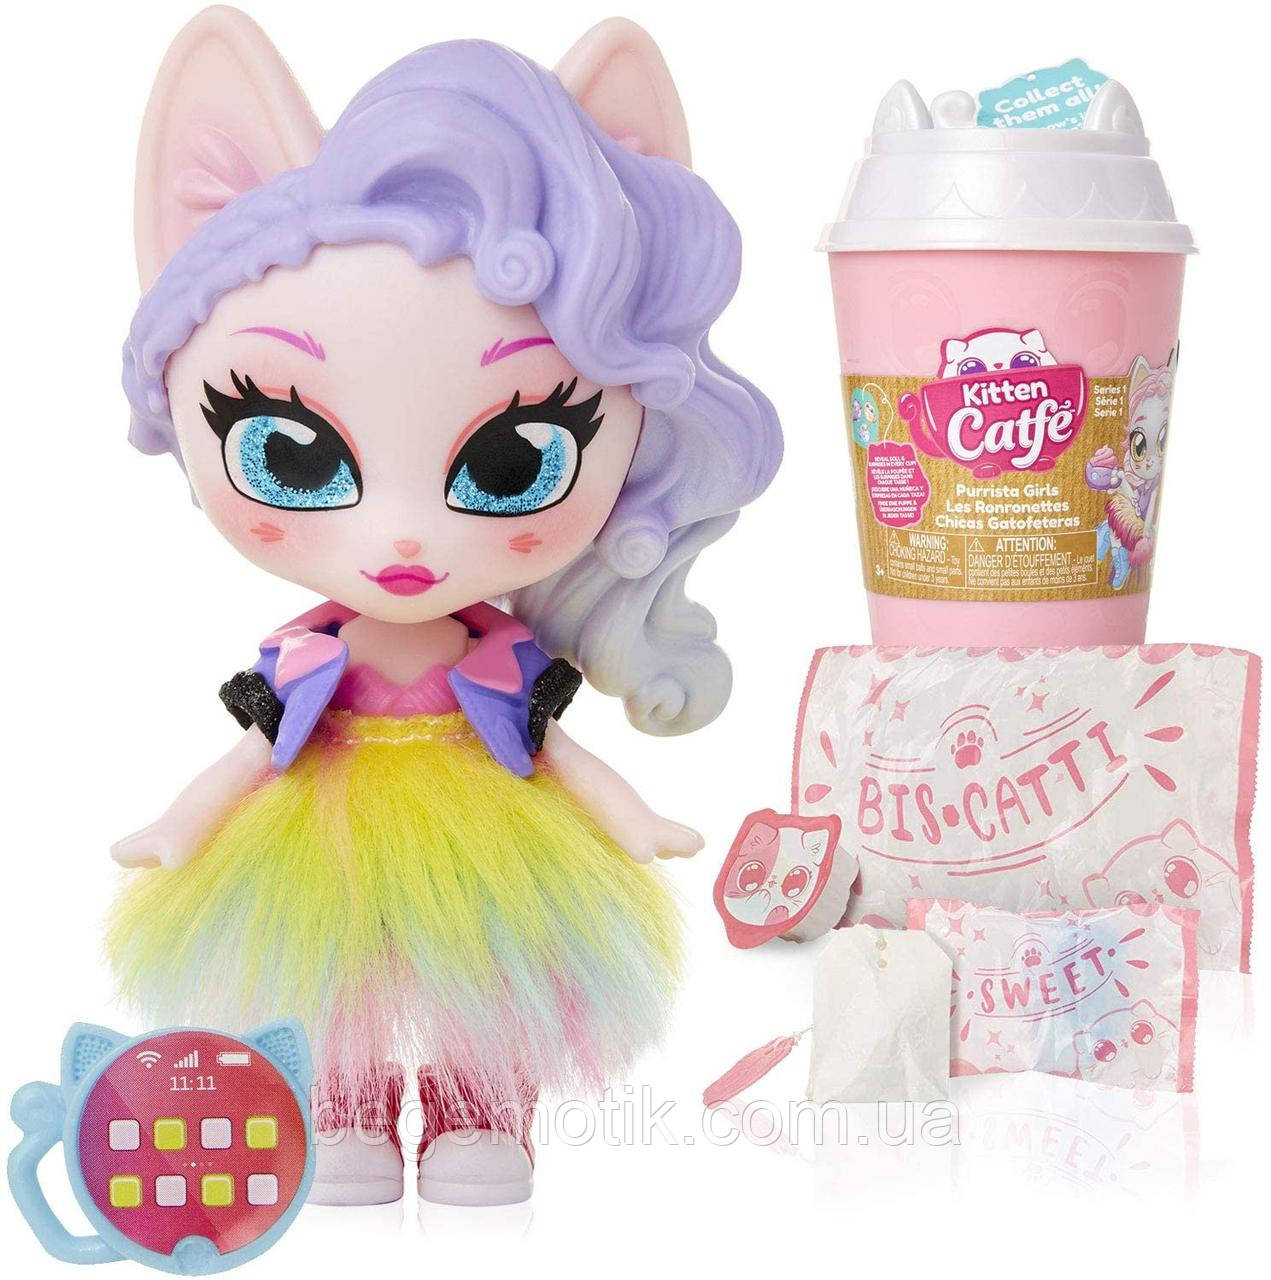 Kitten Catfe  Игрушка сюрприз Котик с аксессуарами серия 1 Purrista Girls Doll Figures Series 1